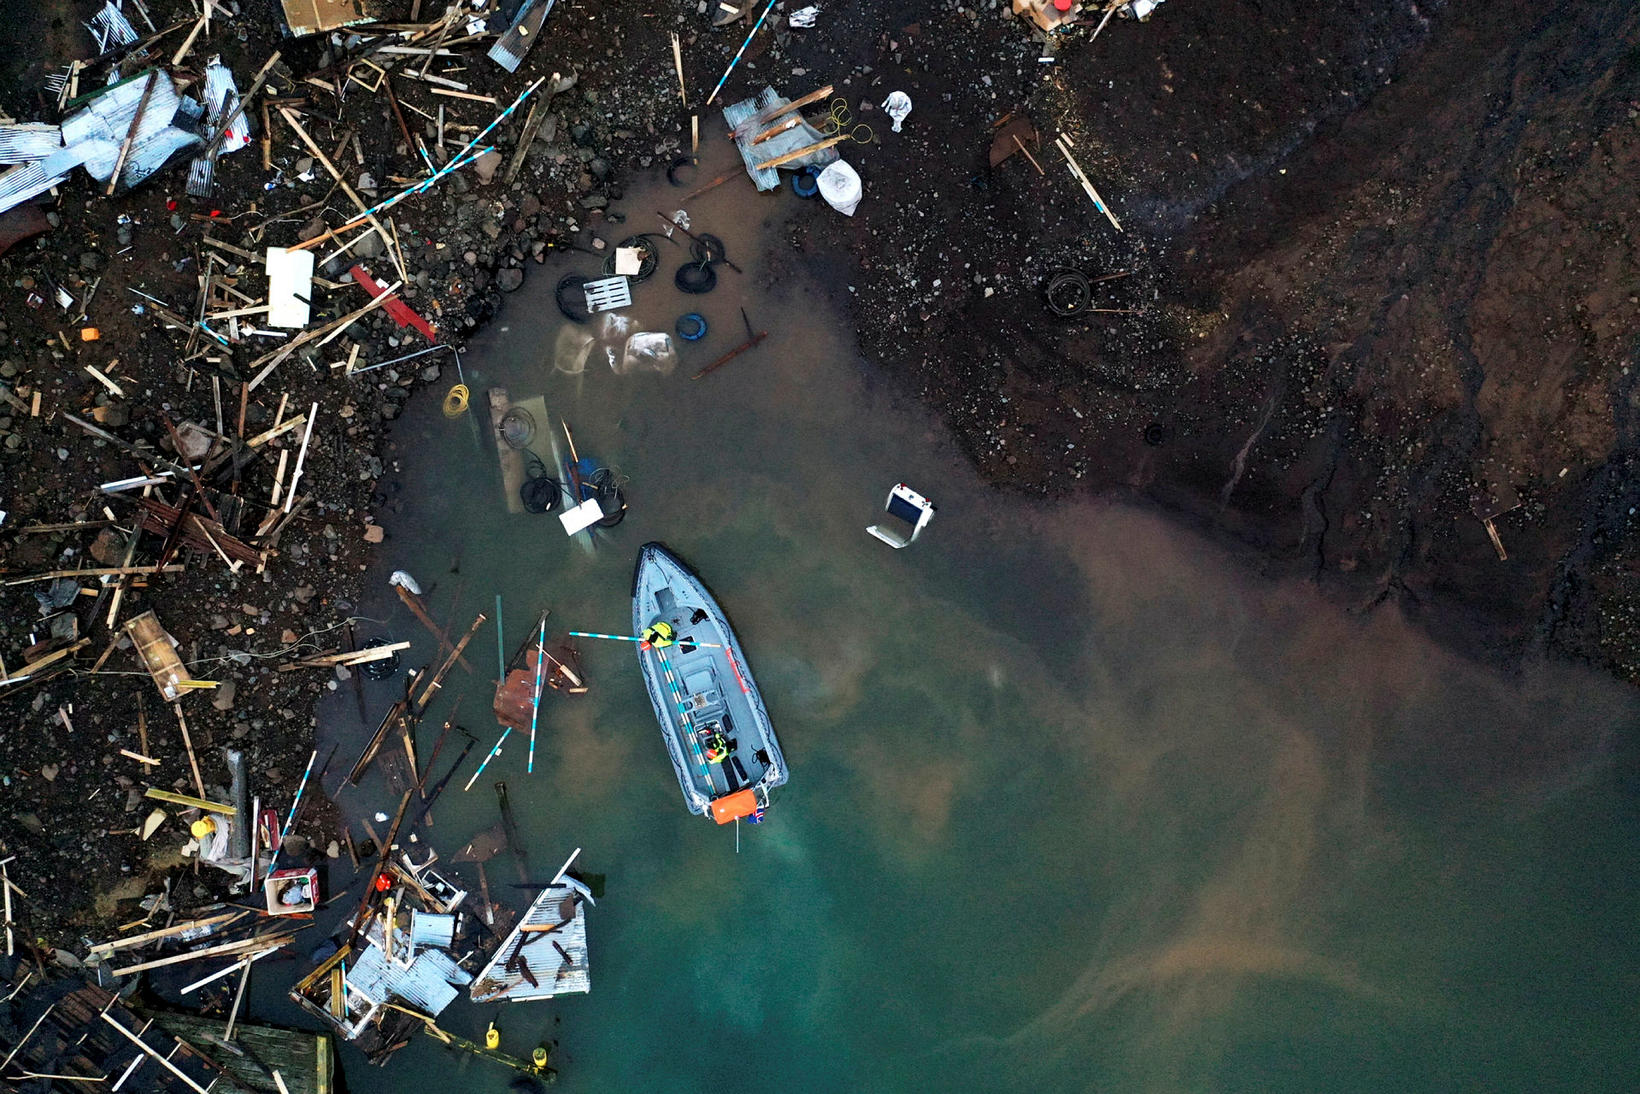 Debris in the ocean.